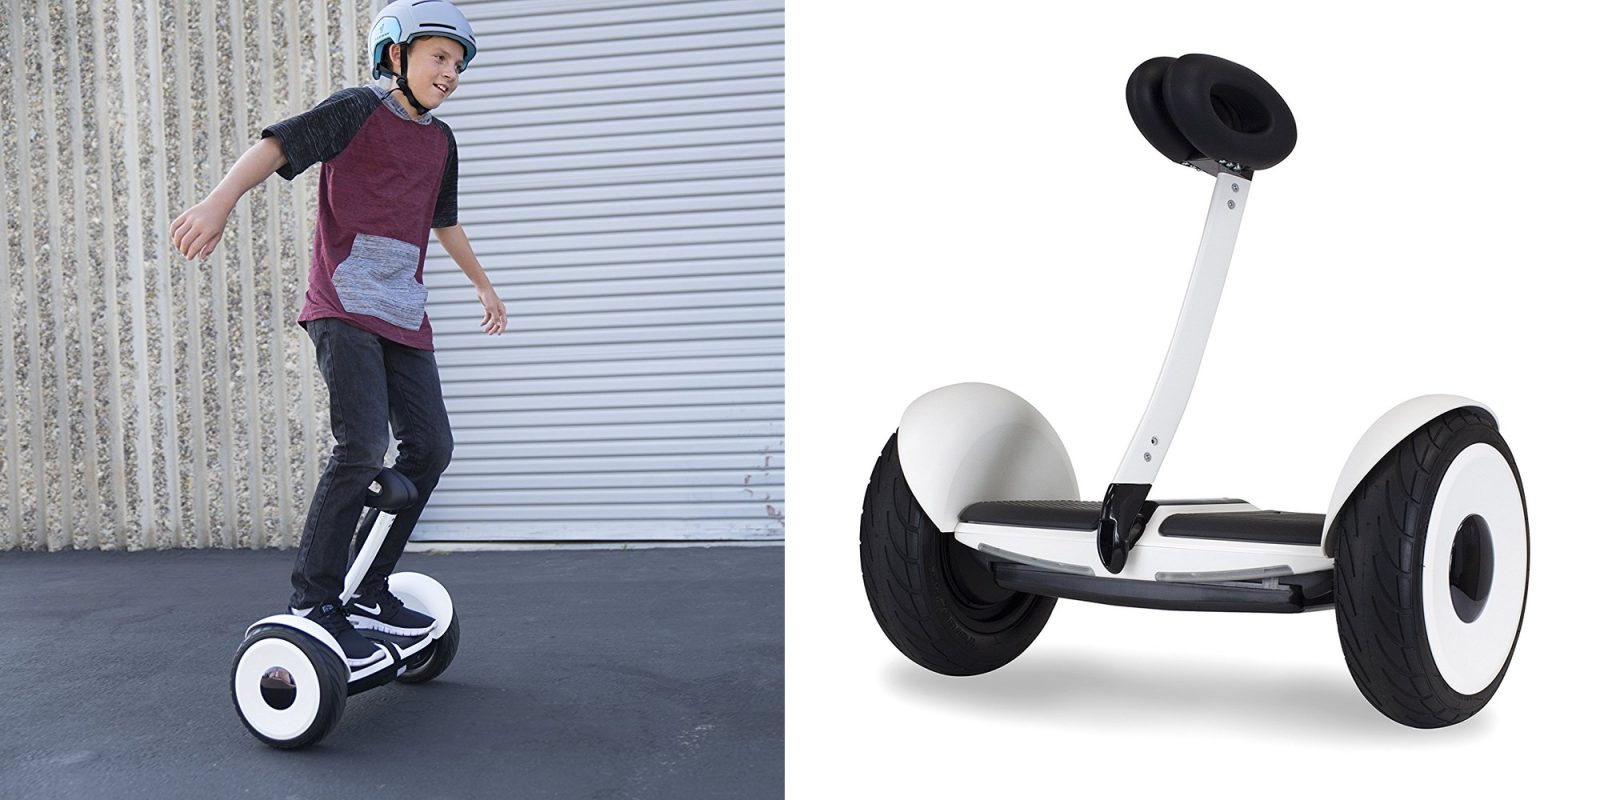 hop on the segway minilite smart self balancing personal. Black Bedroom Furniture Sets. Home Design Ideas